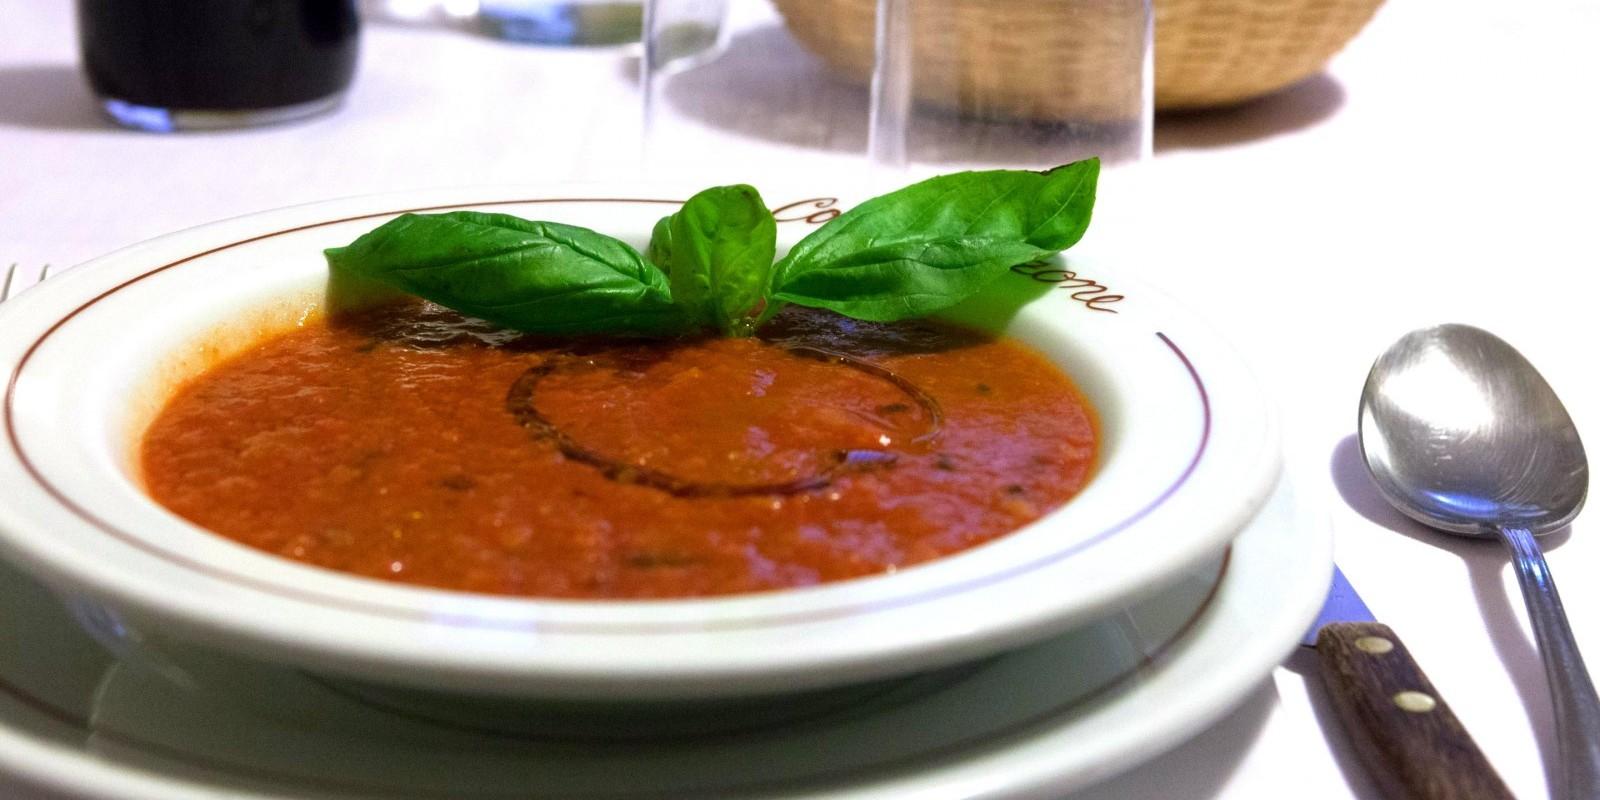 La cucina tradizionale toscana speciale zuppe dove e for La casa toscana tradizionale